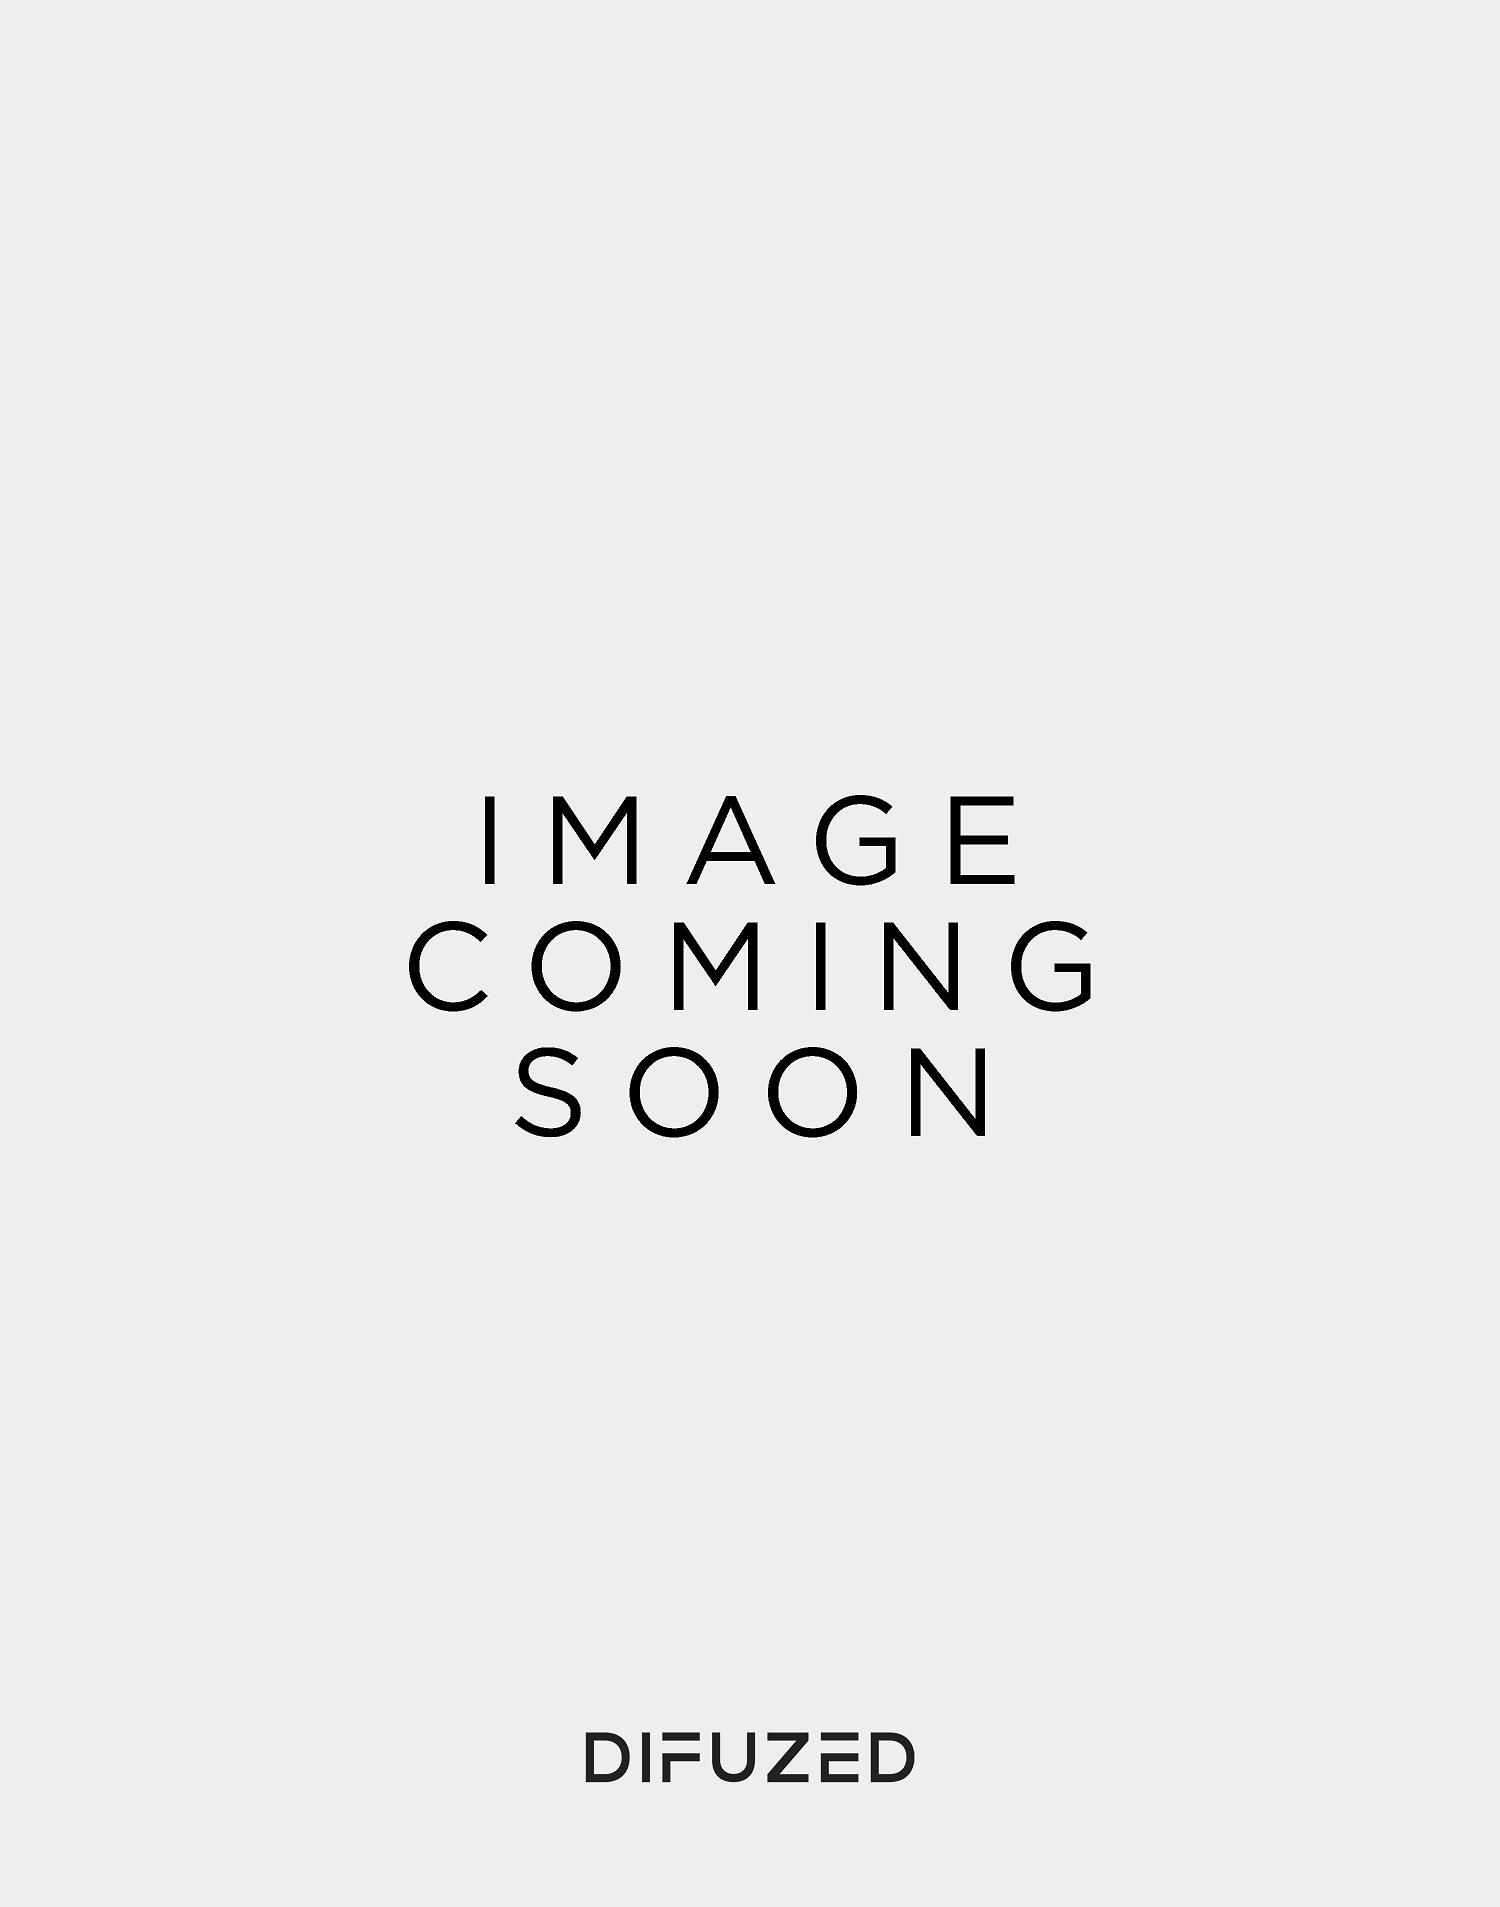 624b0197ea068 Disney - Lion King Hakuna Matata Silhouette Adjustable … BA742440TLK.  BA230907POK. Pokémon - Sun   Moon Curved Bill Cap